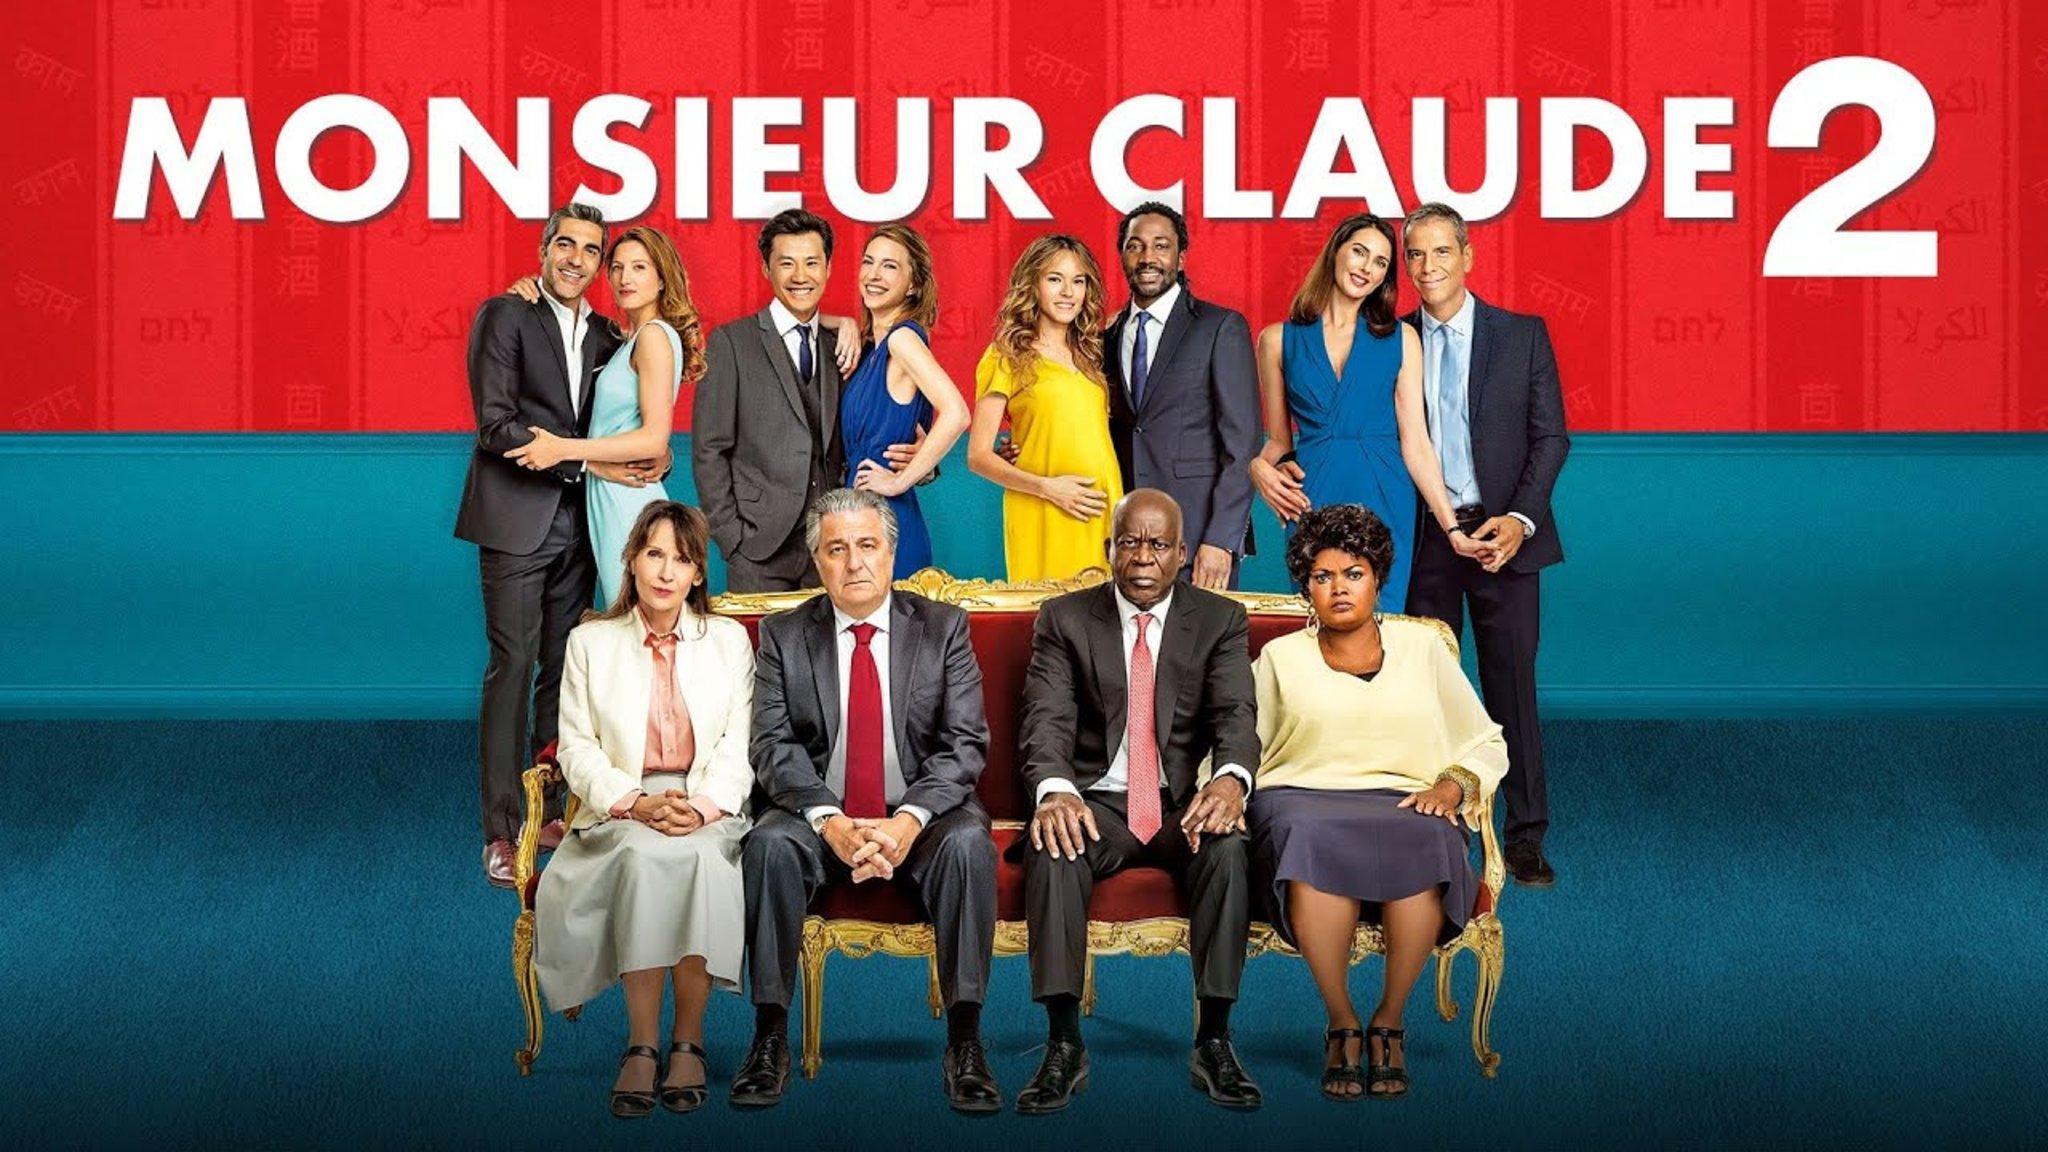 Monsieur Claude 2 Imdb